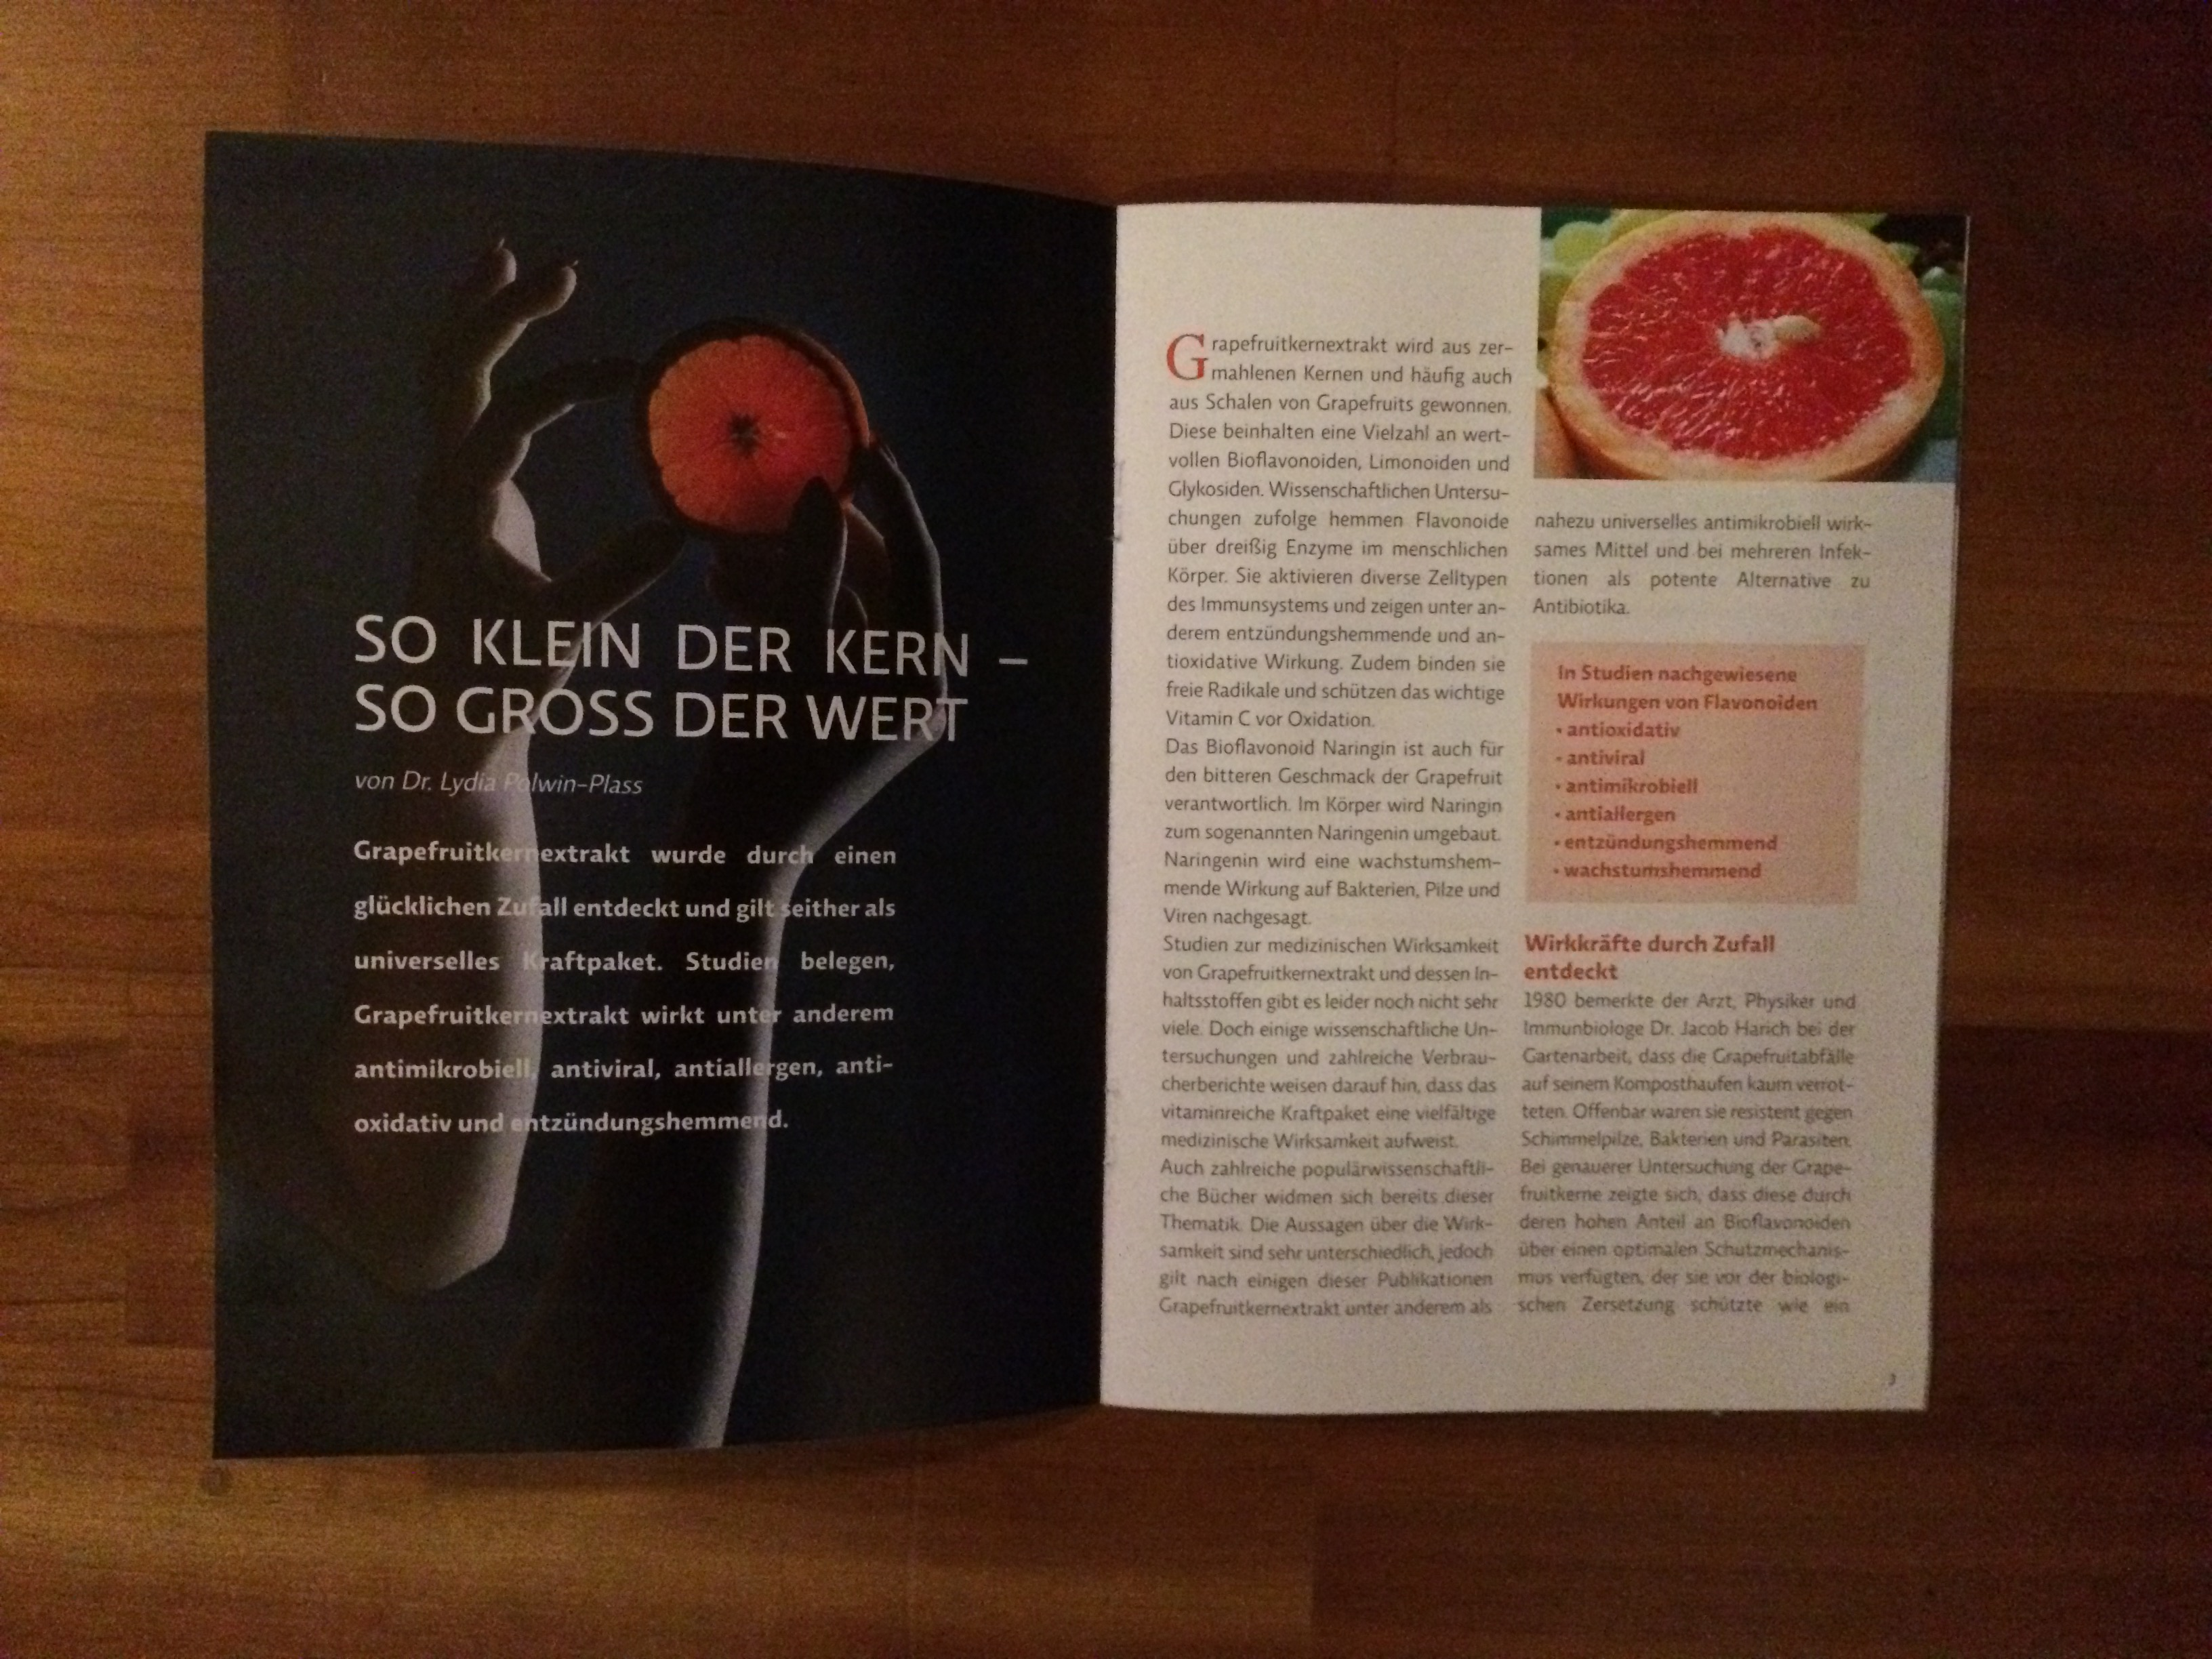 Broschuere_Grapefruitkernextrakt_Lydia Polwin-Plass